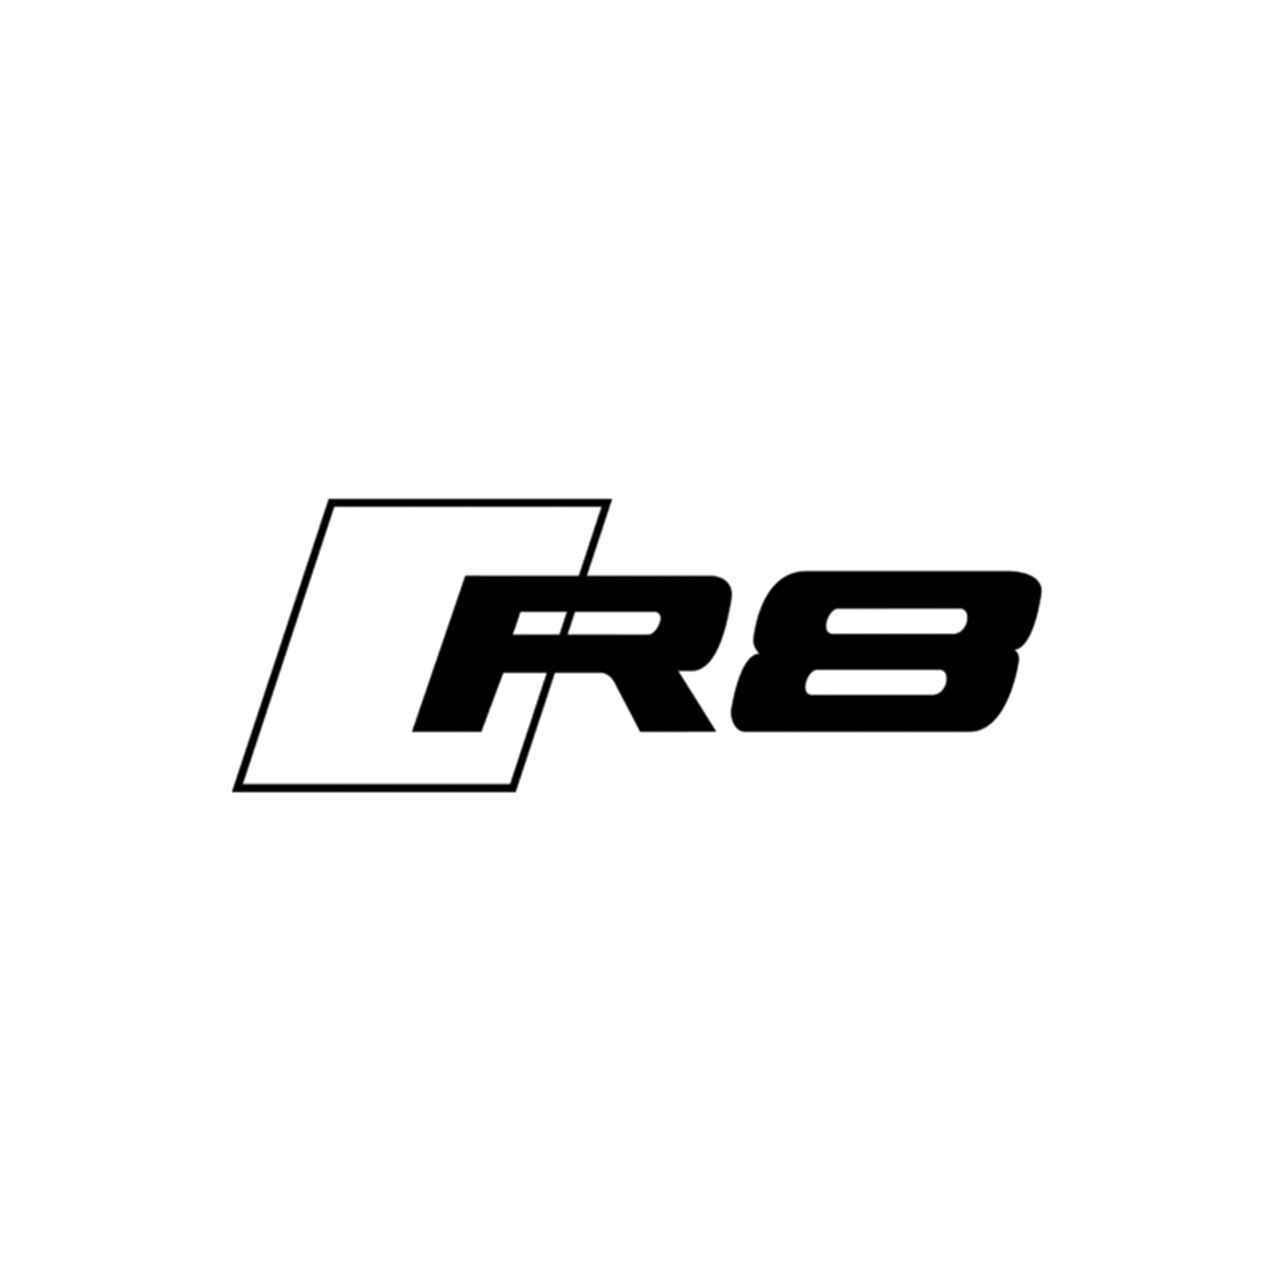 Audi-R8-Logo-Vinyl-Decal-Sticker__54919.1508639864.jpg